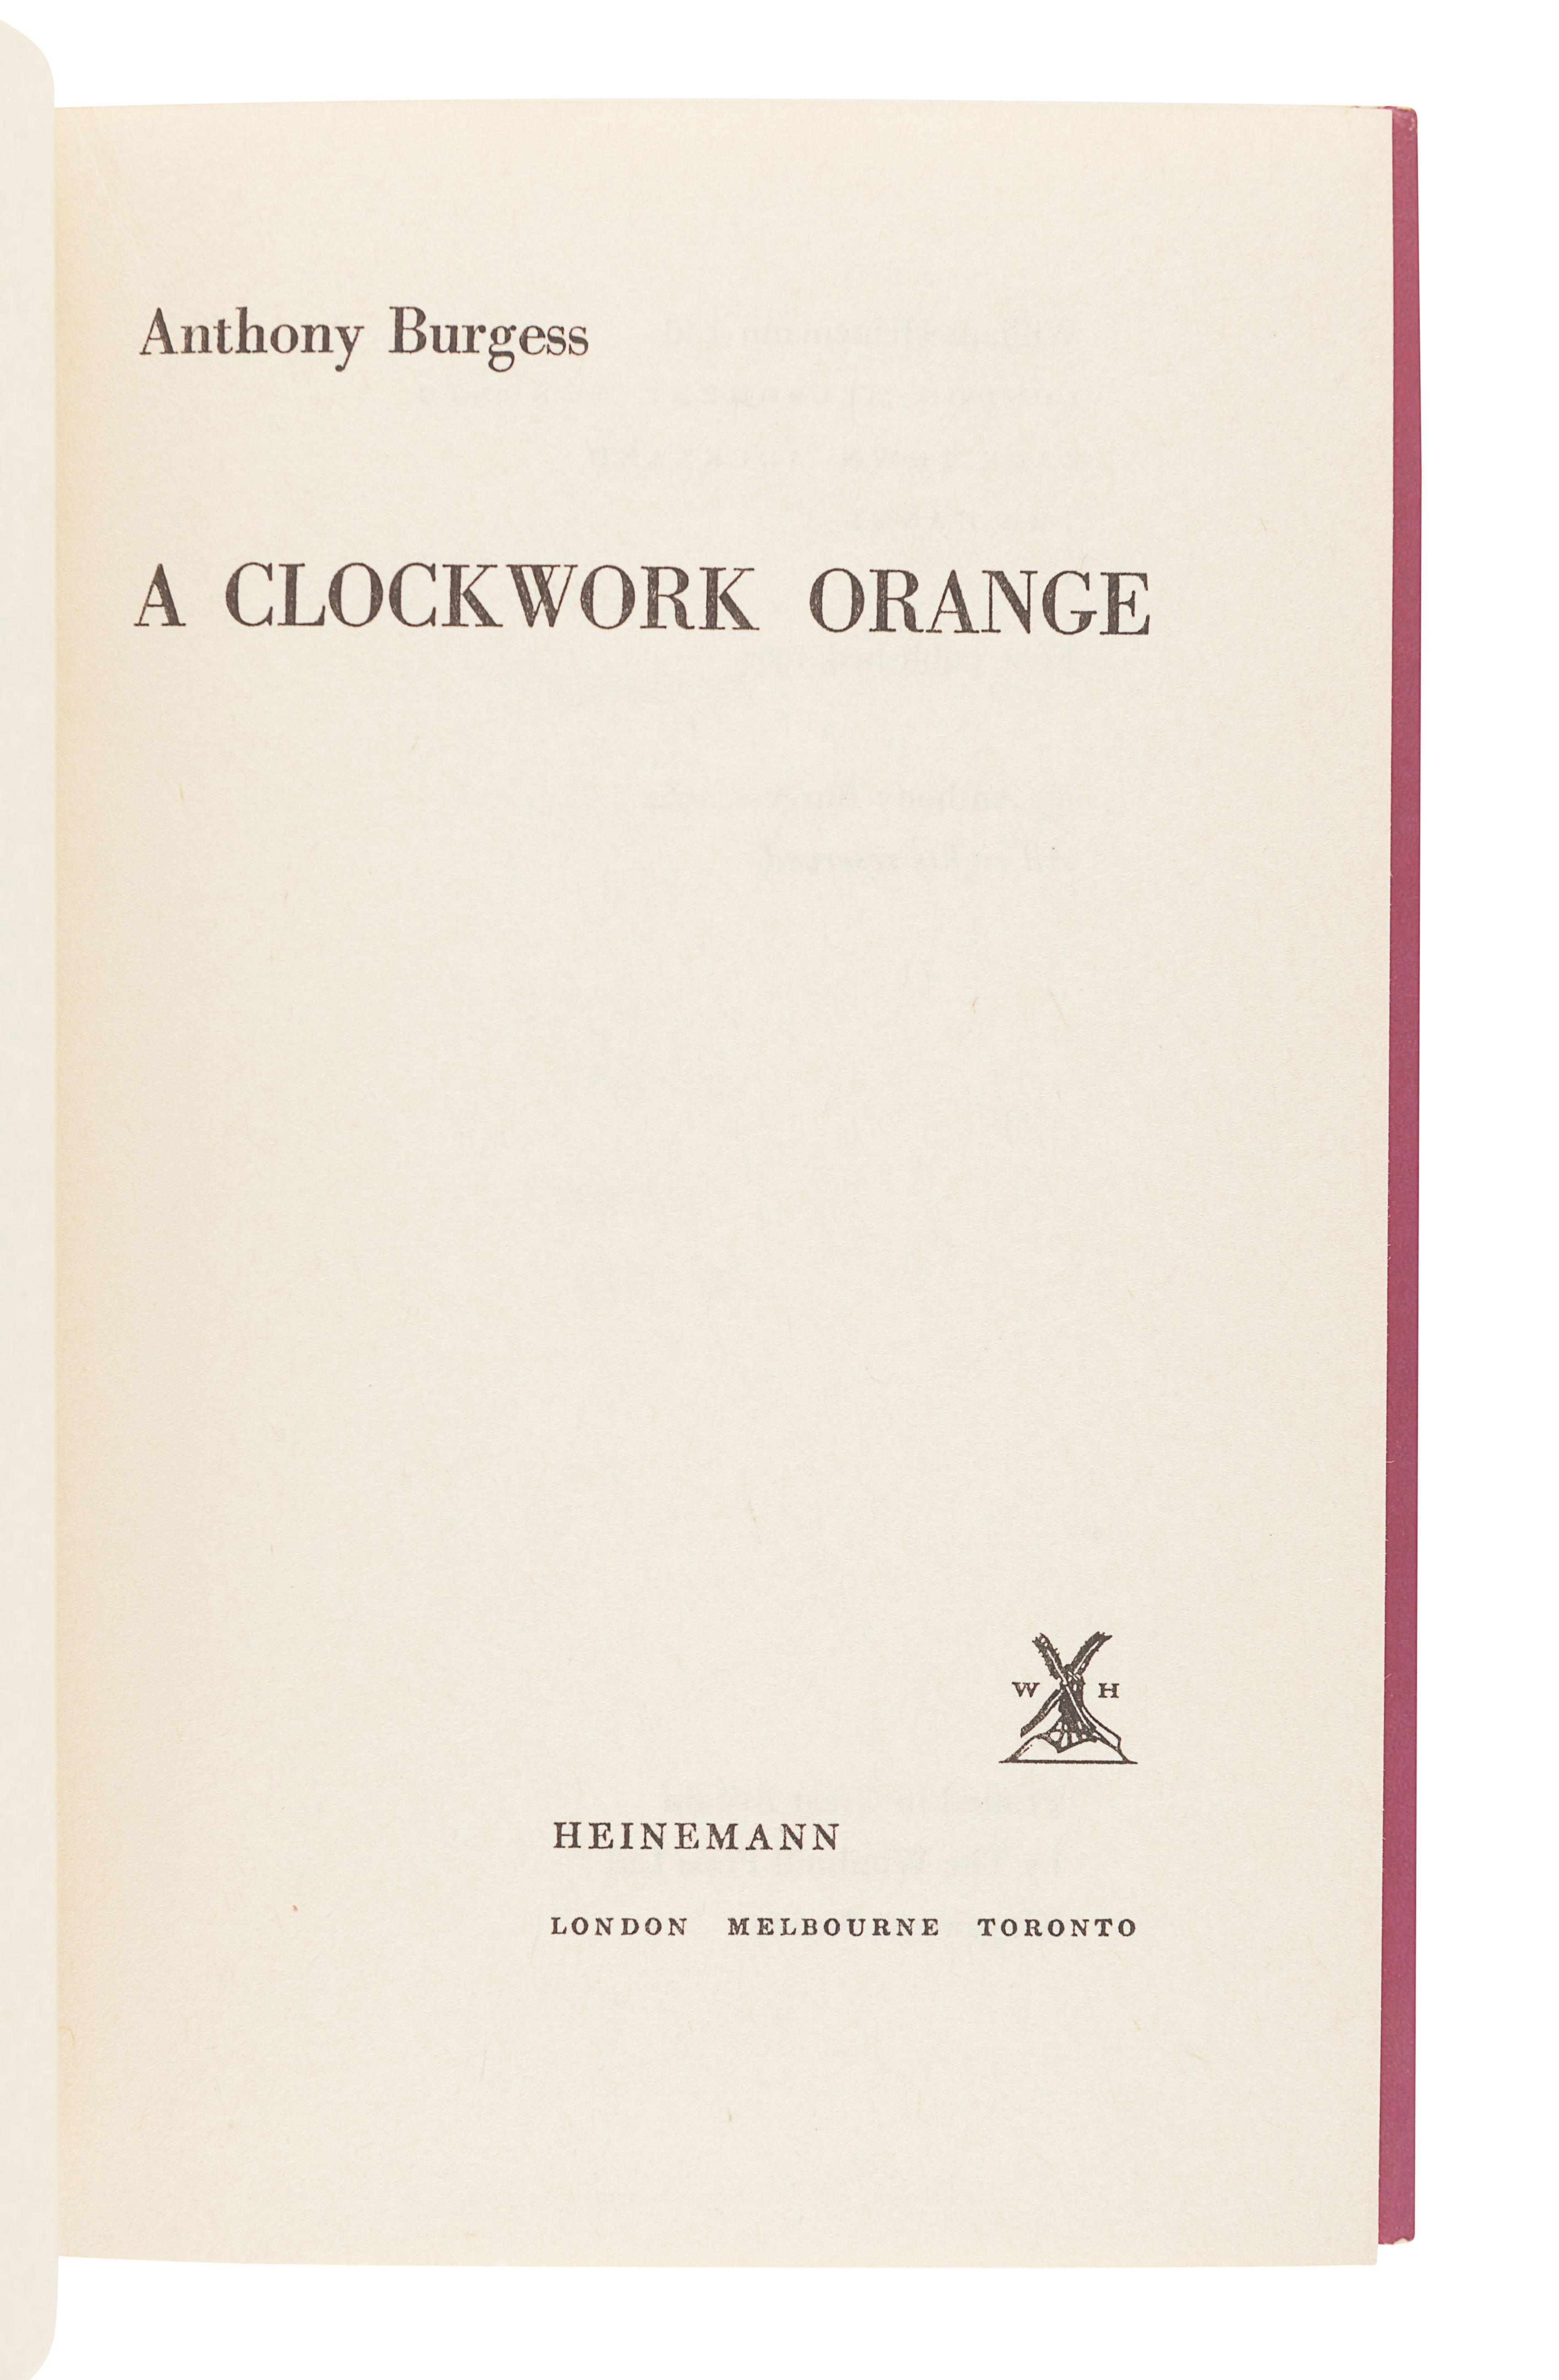 BURGESS, Anthony (1917-1993). A Clockwork Orange. London: Heinemann, 1962. - Image 3 of 3